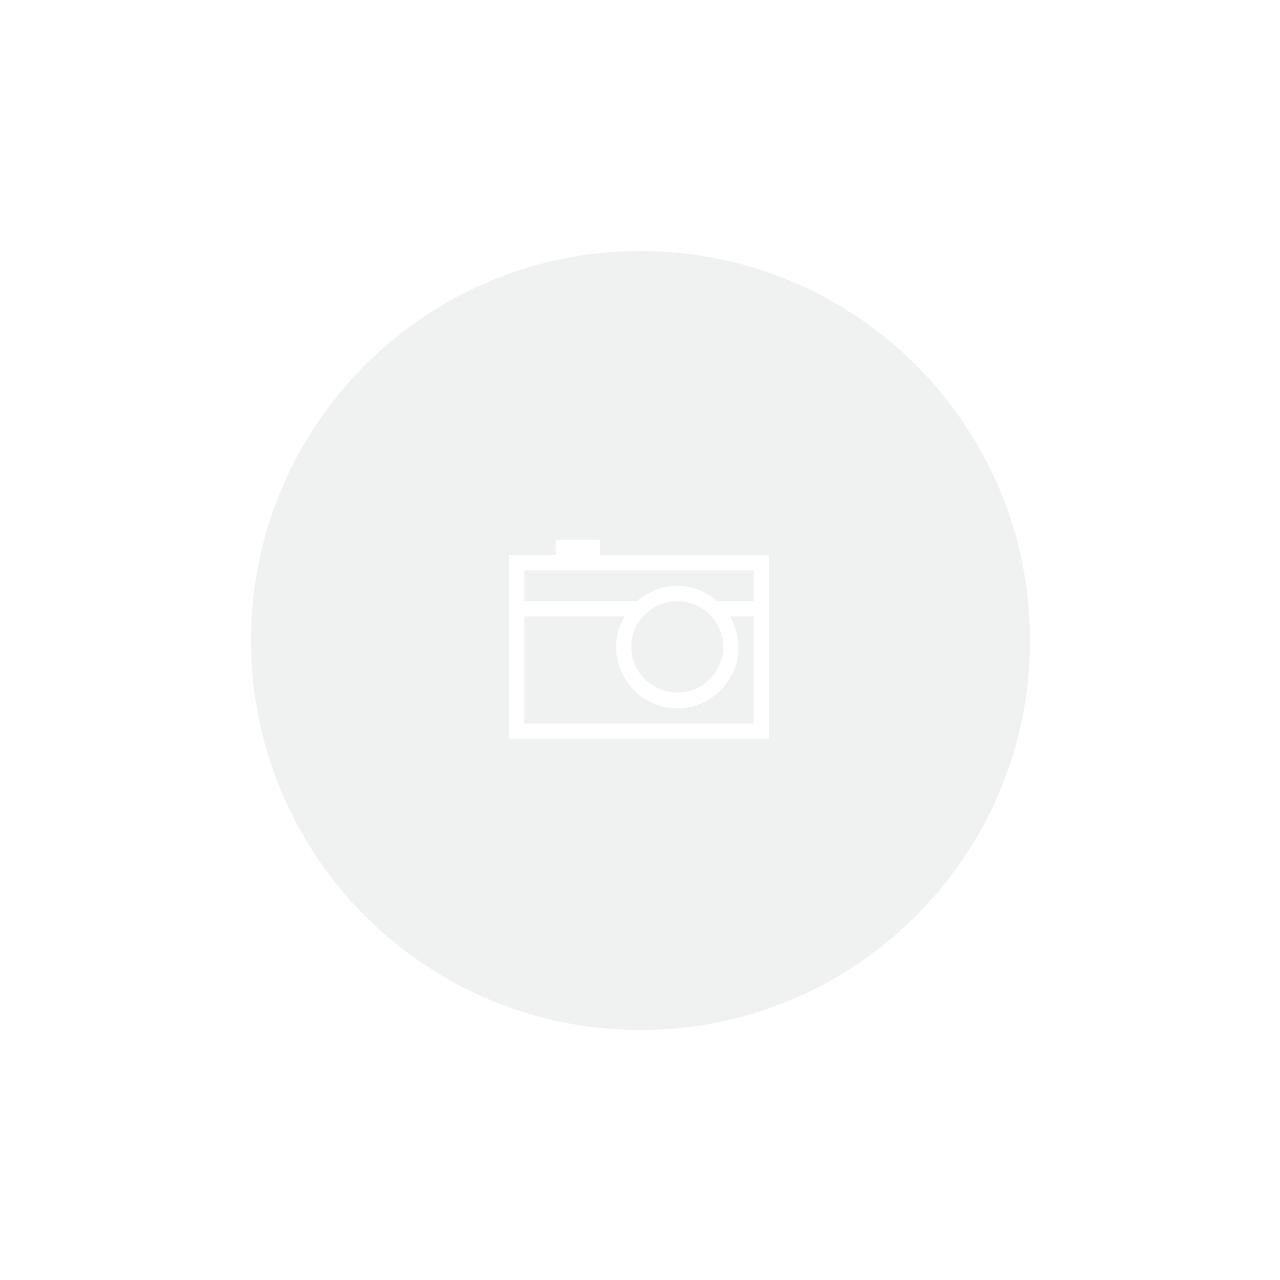 BICICLETA 29 BMC ALPENCHALLENGE 01 FOUR 2020 11V APEX